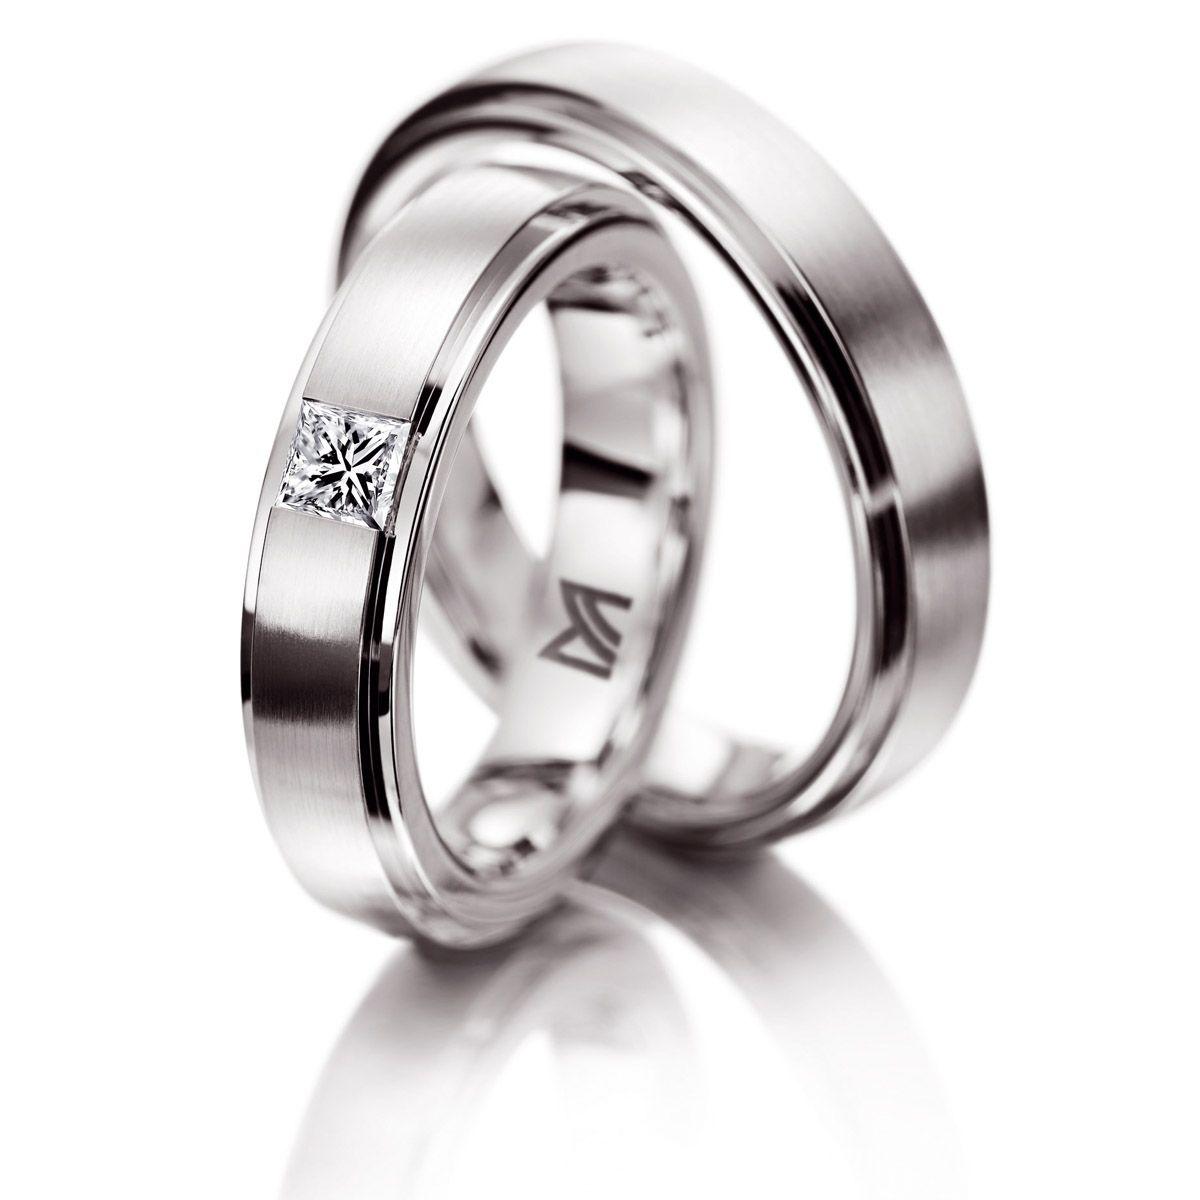 Eheringe Platin Eheringe Meister Platin Online Kaufen Wedding